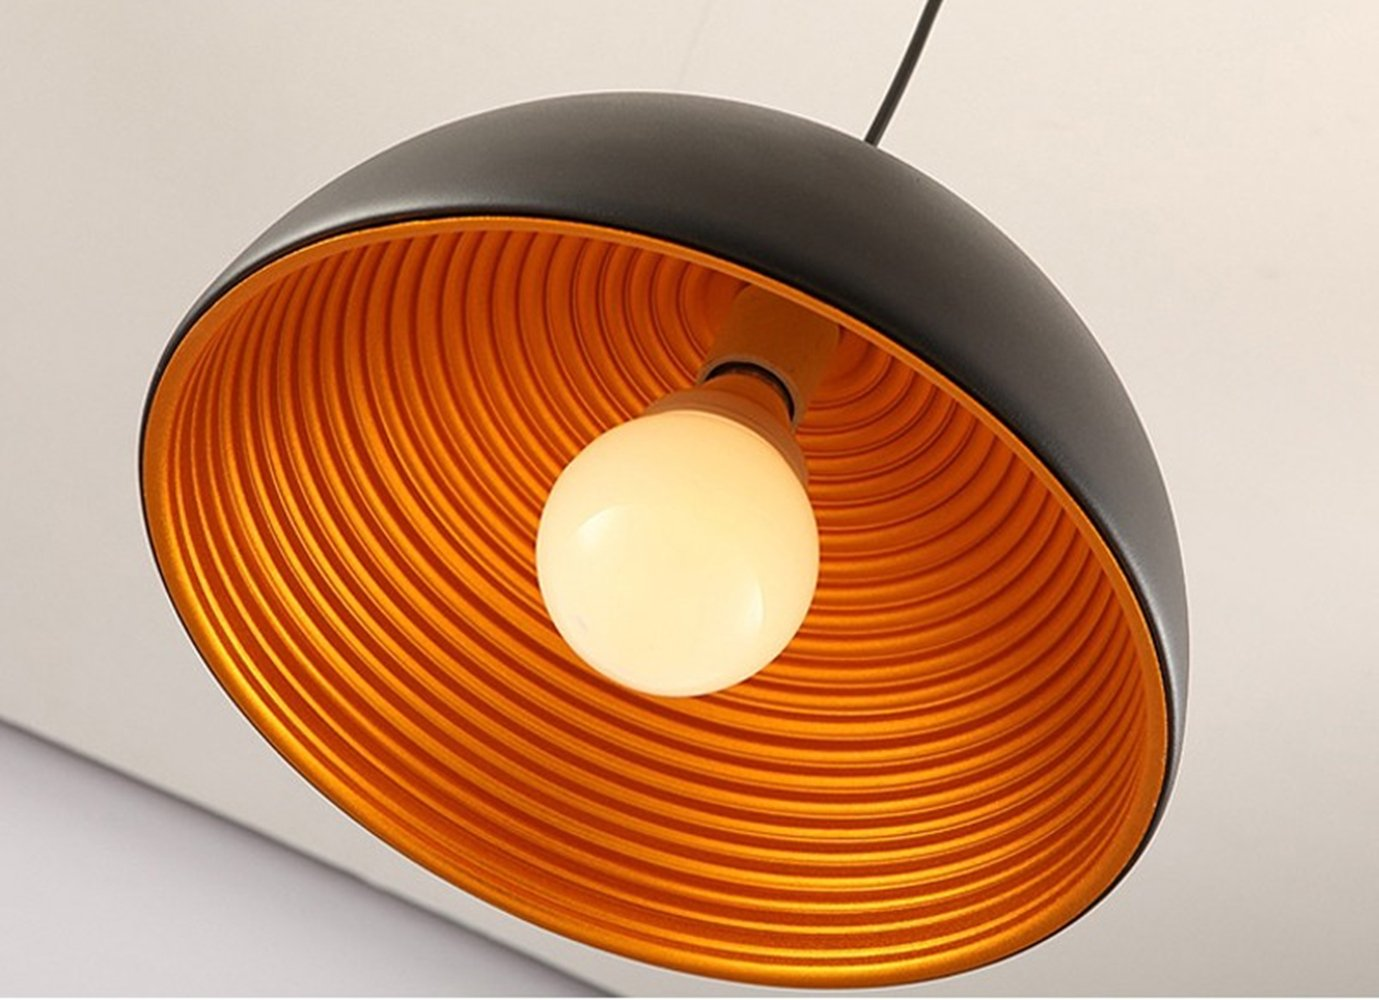 Plafoniere Industriali Diametro 30 : Semicerchio plafoniera lampada a sospensione industriale lampadario